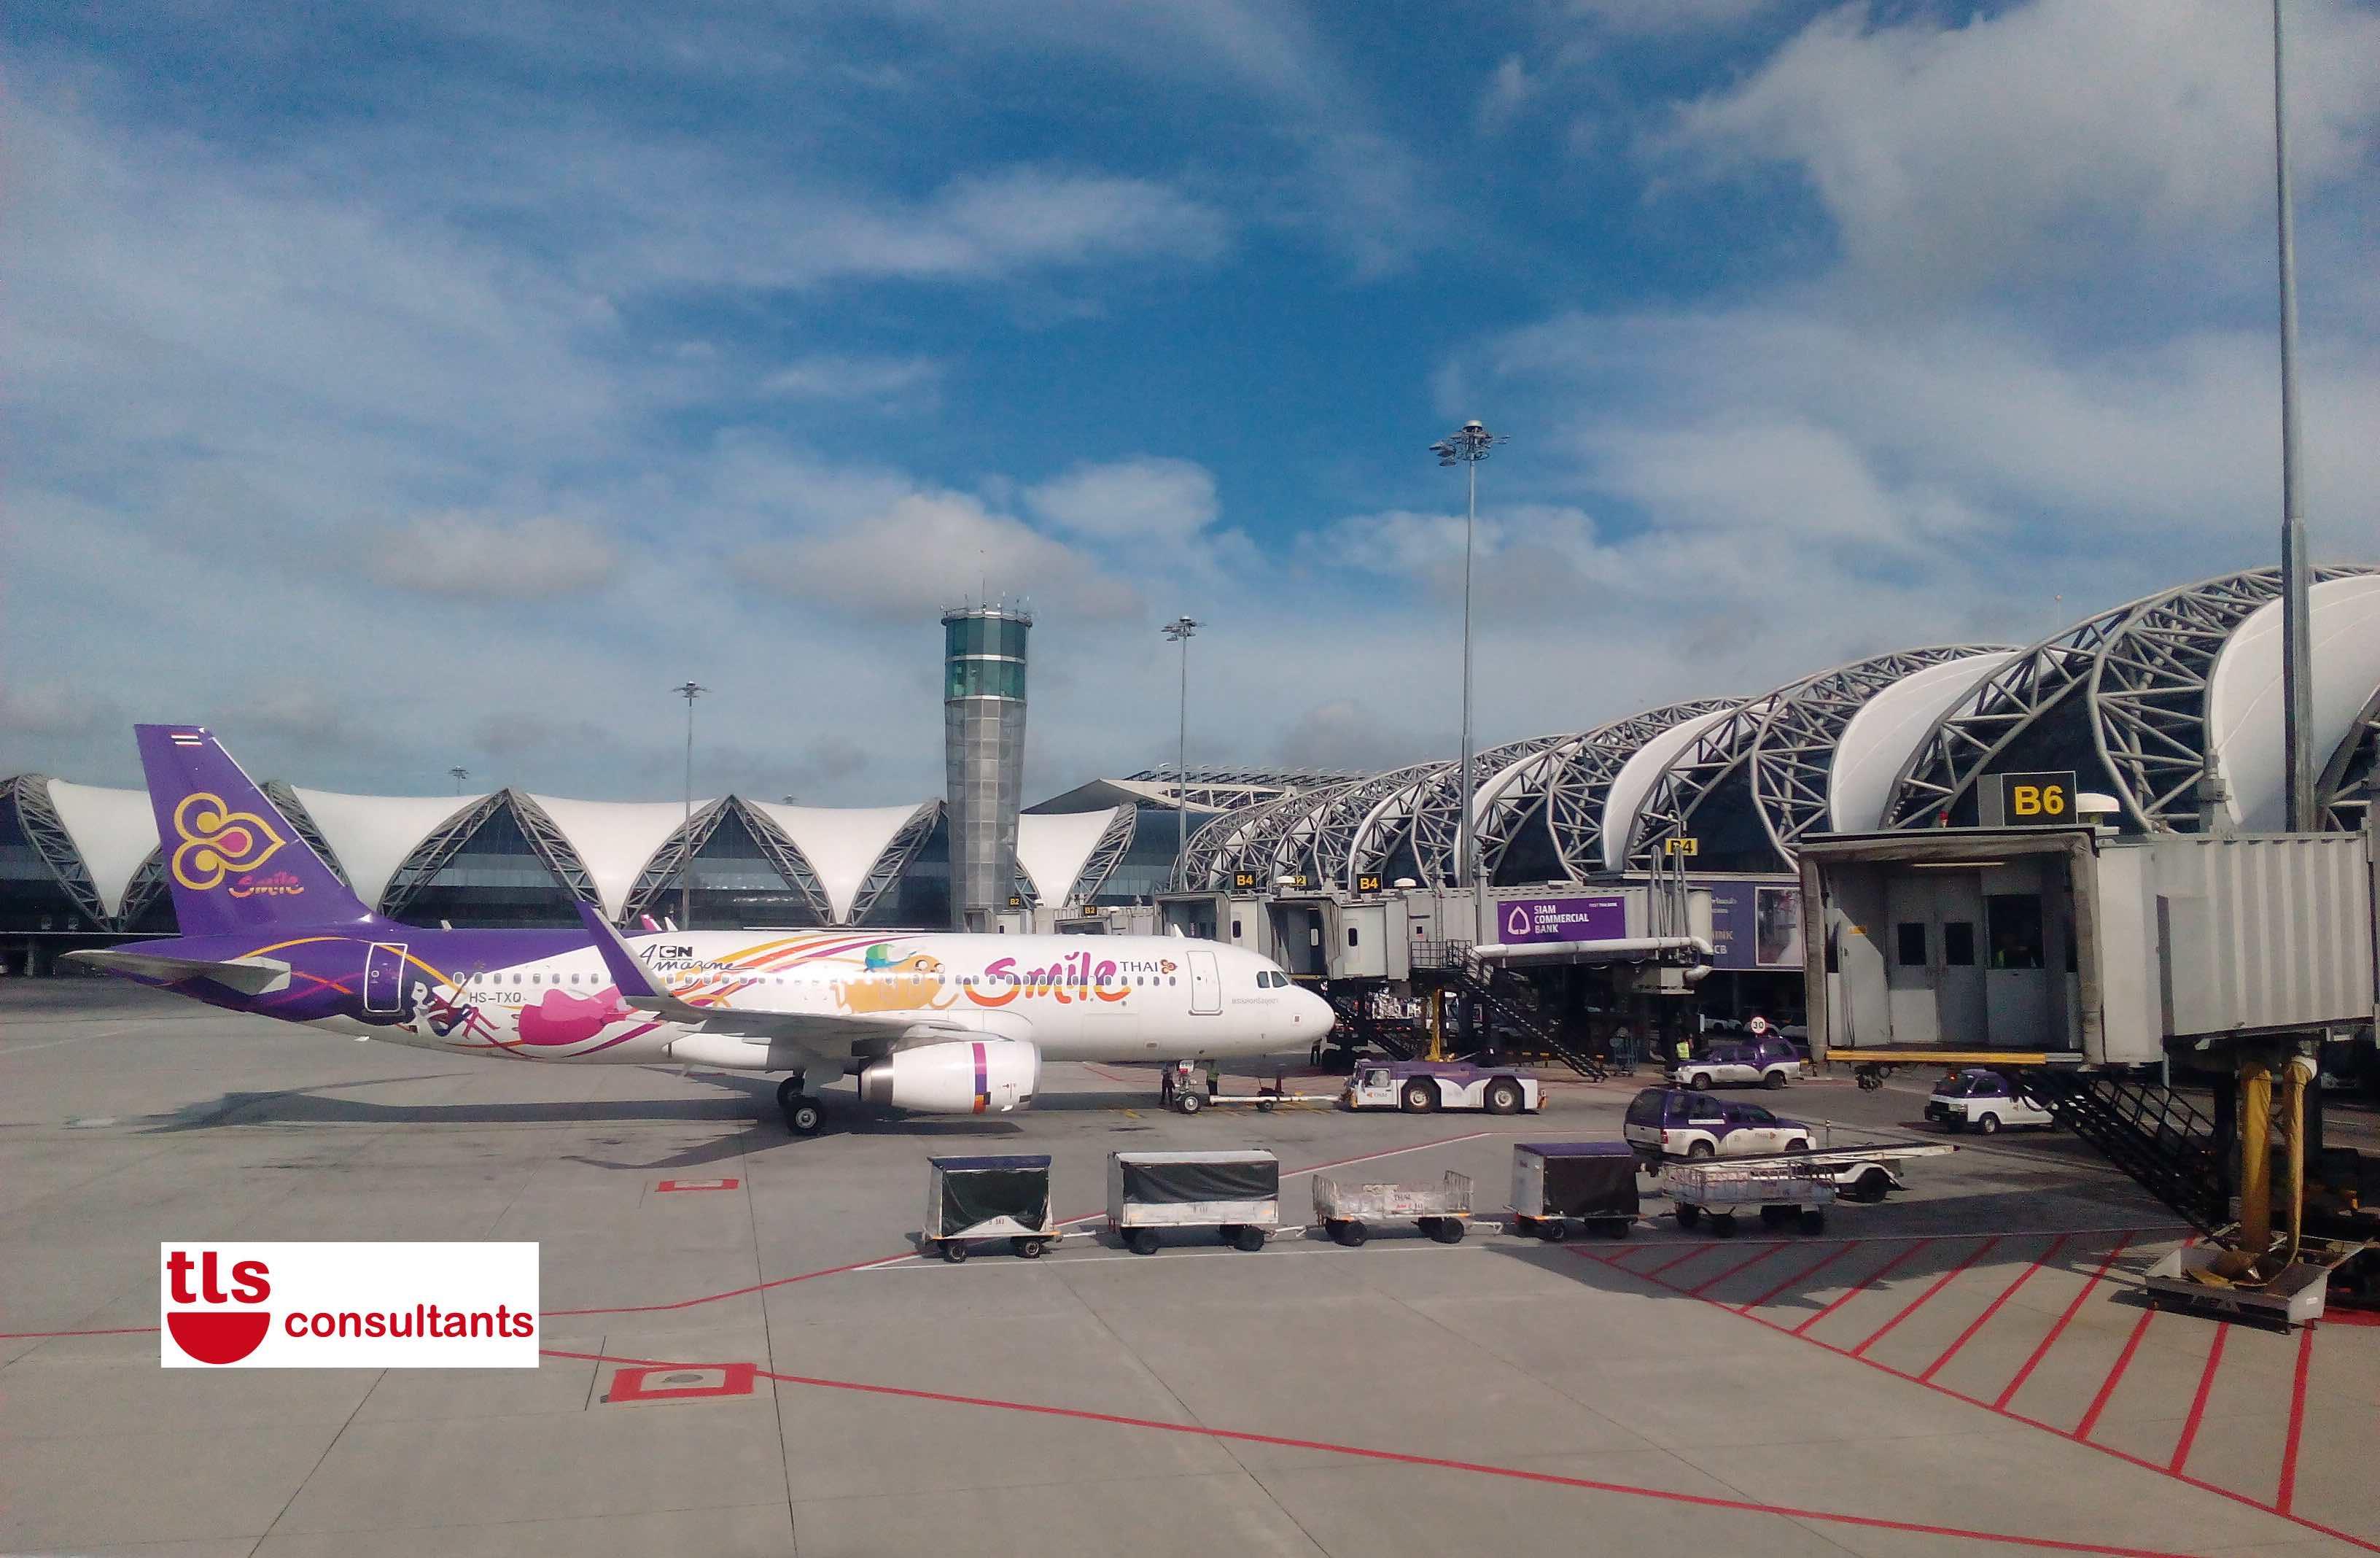 Тайские авиалинии объявили о планах на 2017 год